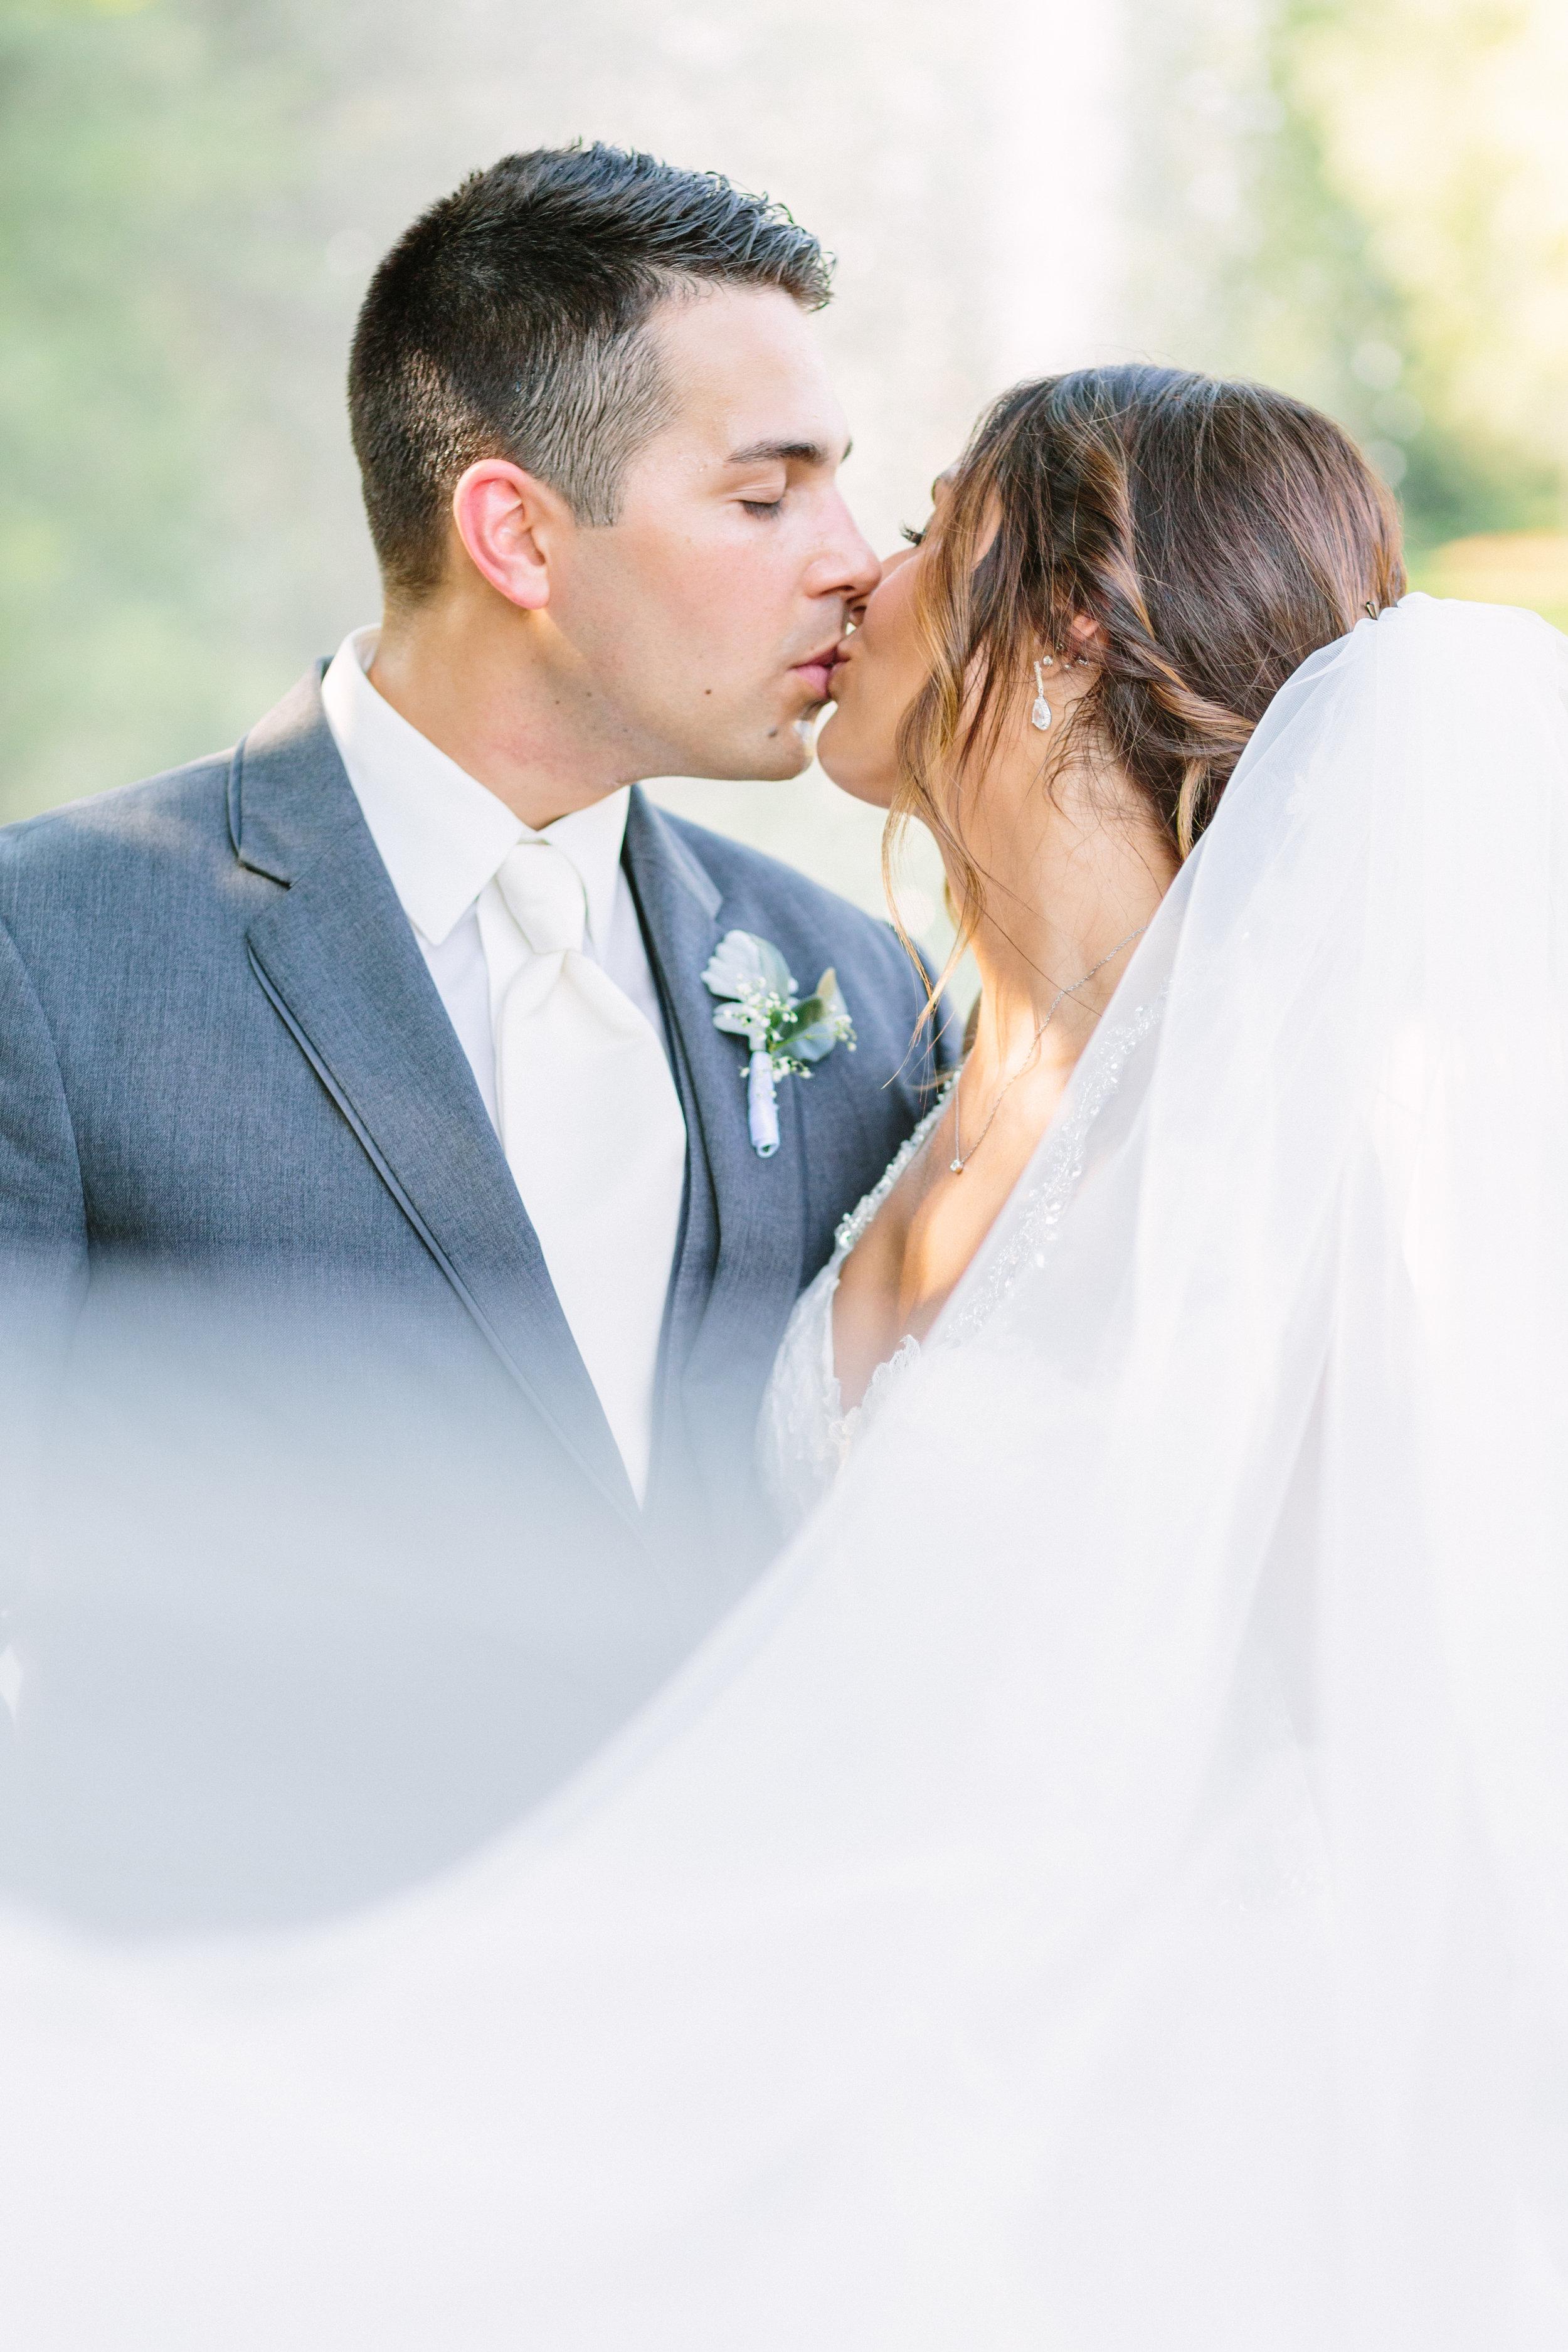 Elegant fine art wedding photography at fellows riverside gardens